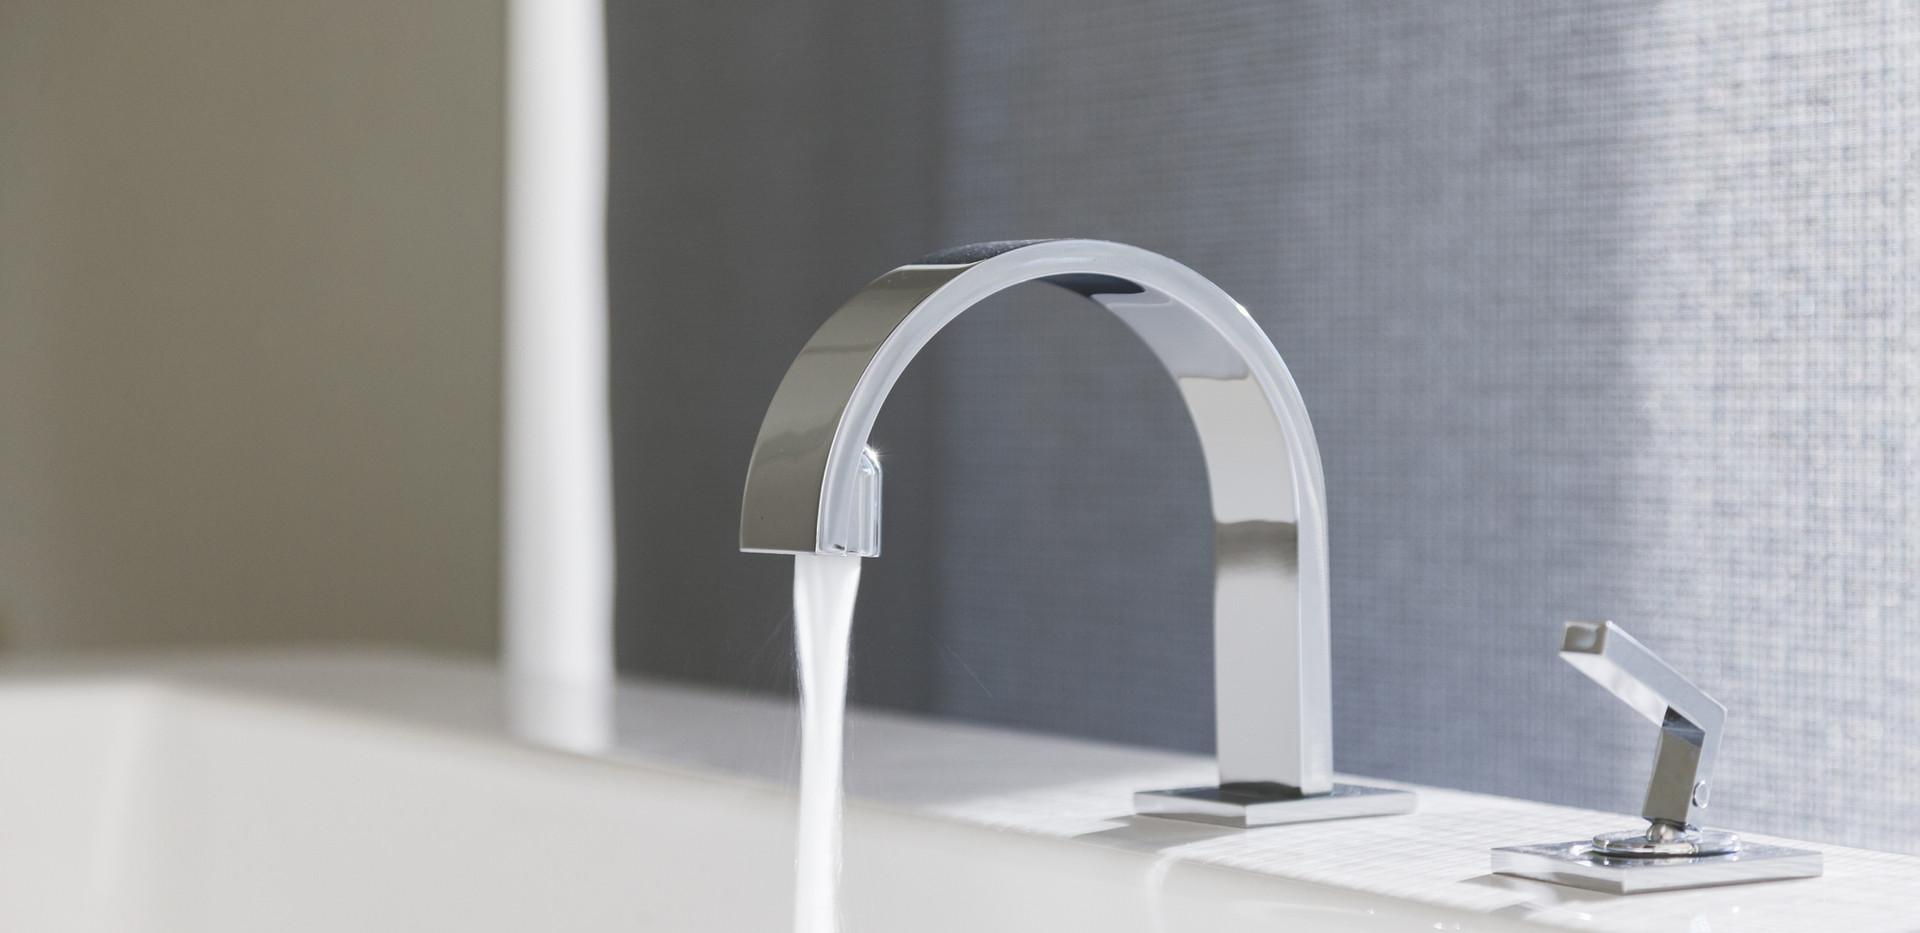 Faucet tap